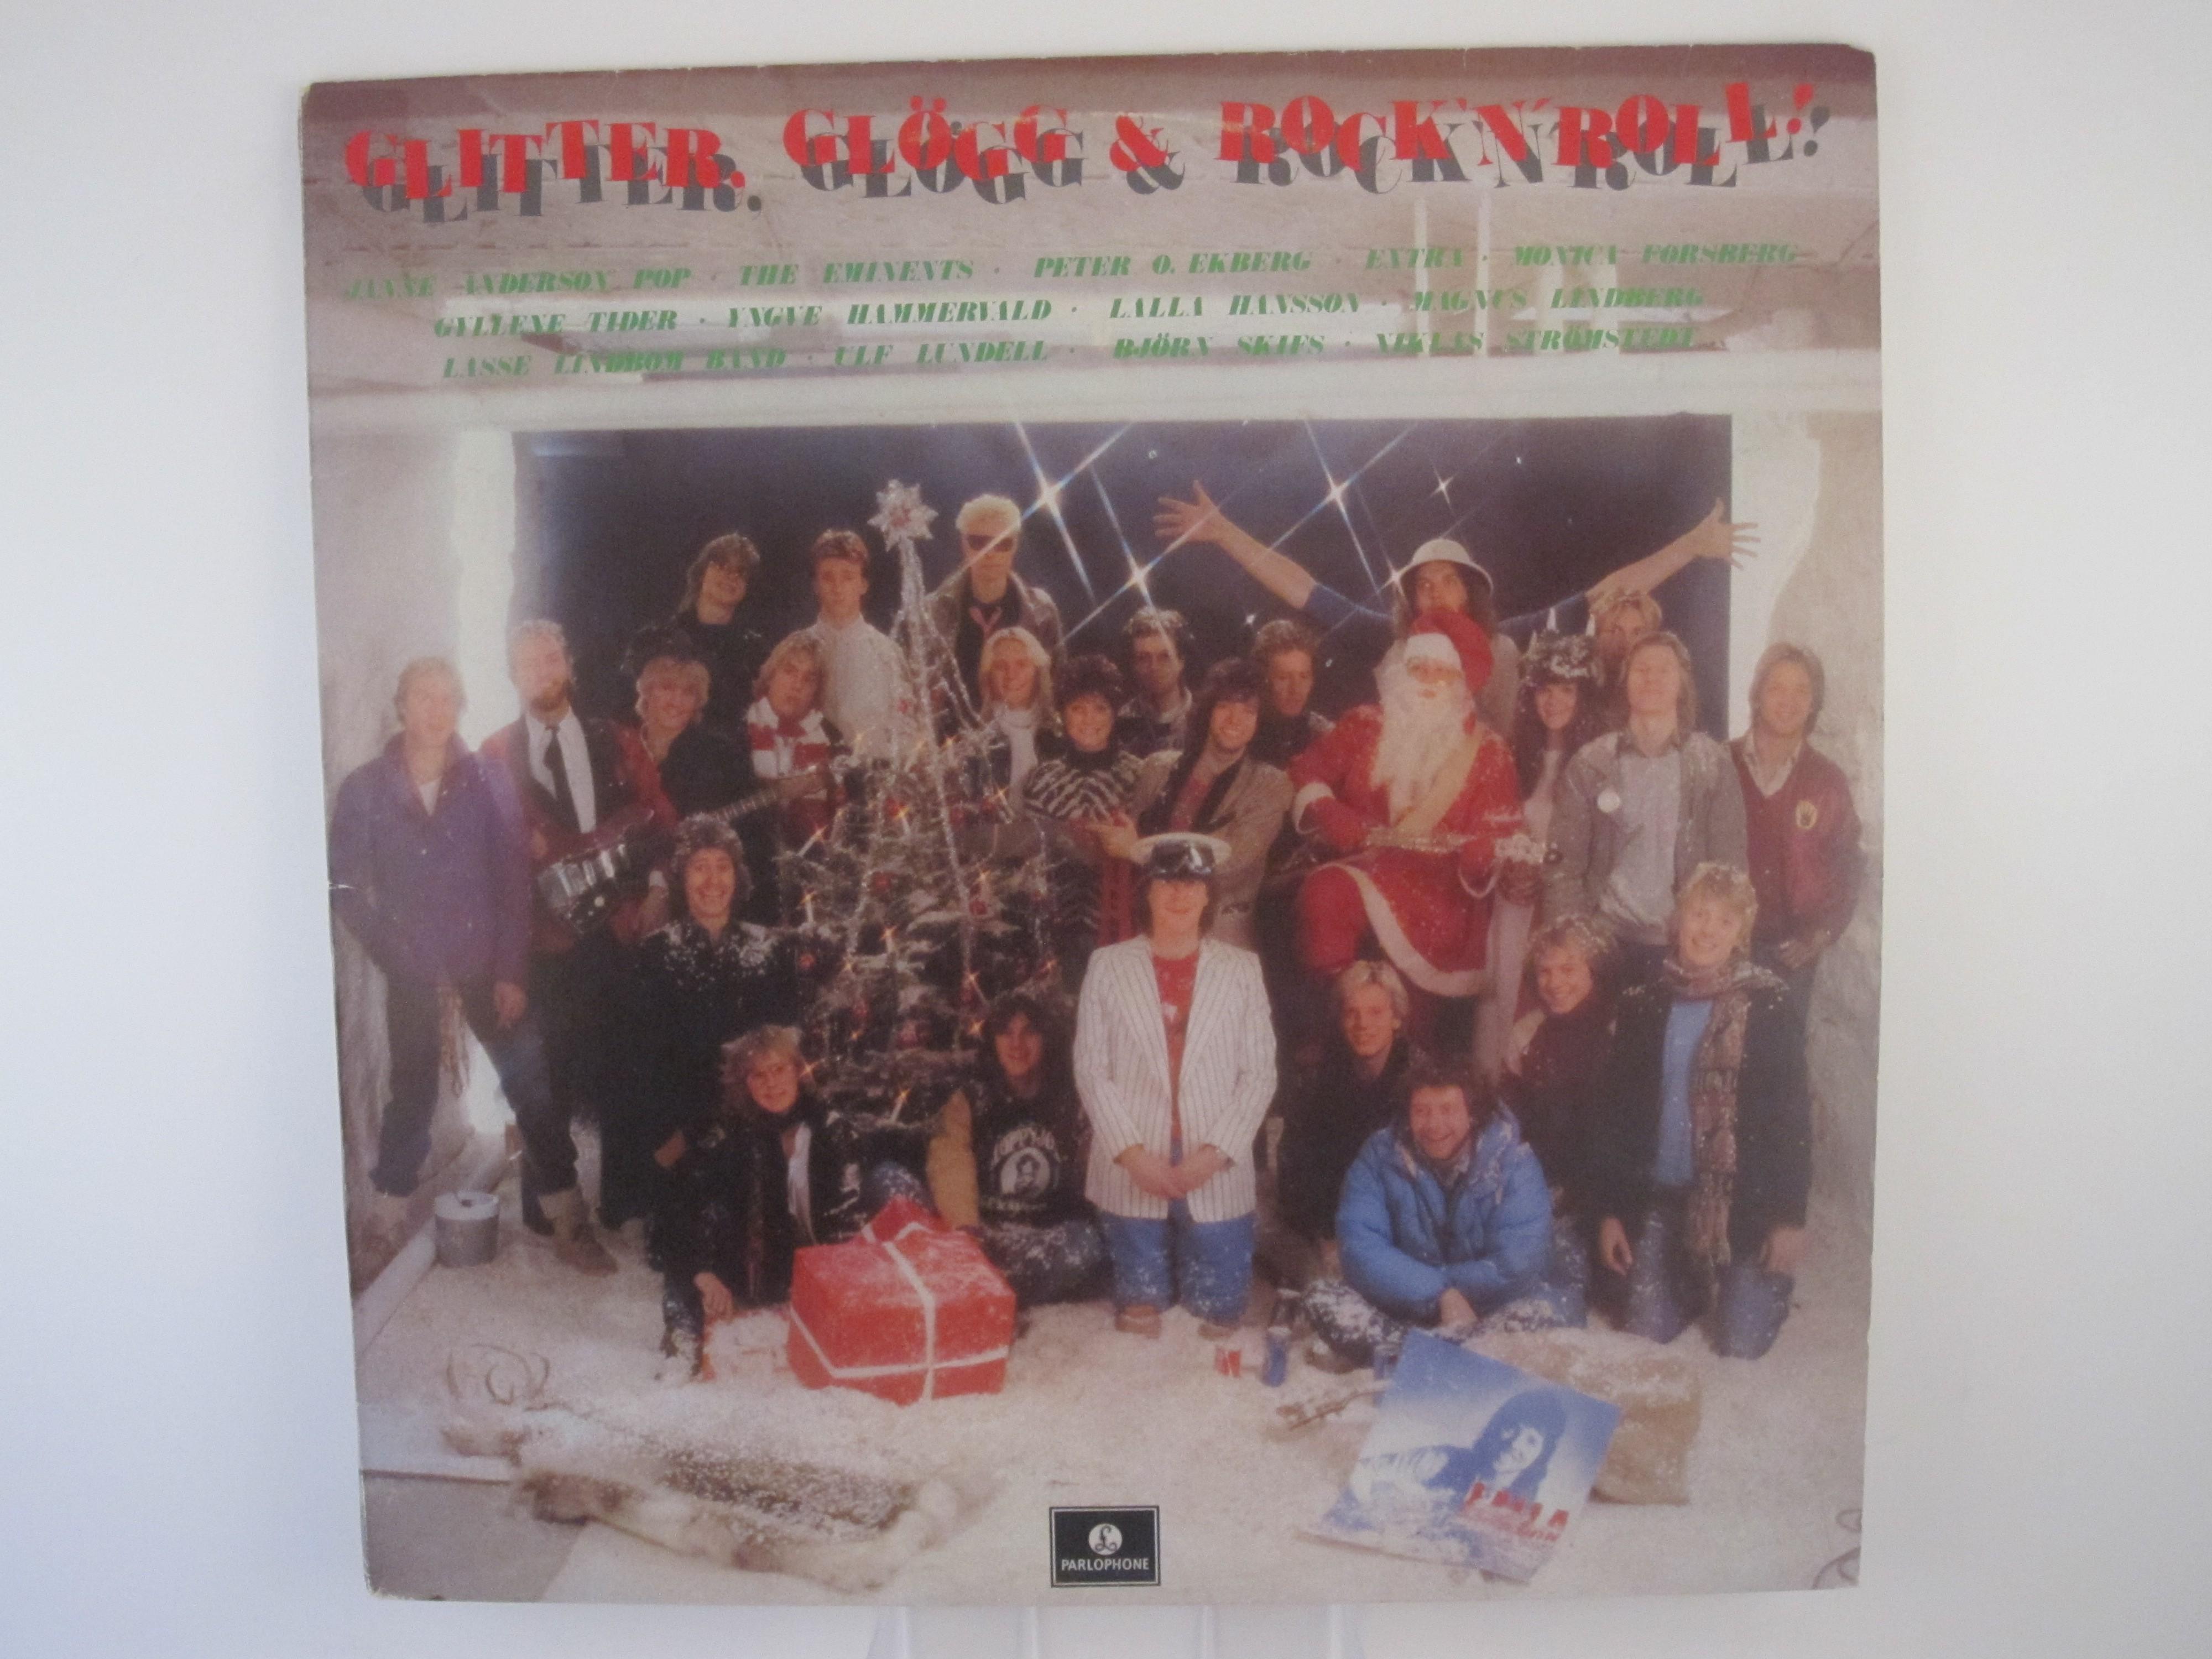 Glitter, Glögg & Rock 'n' Roll : VARIOUS ARTISTS